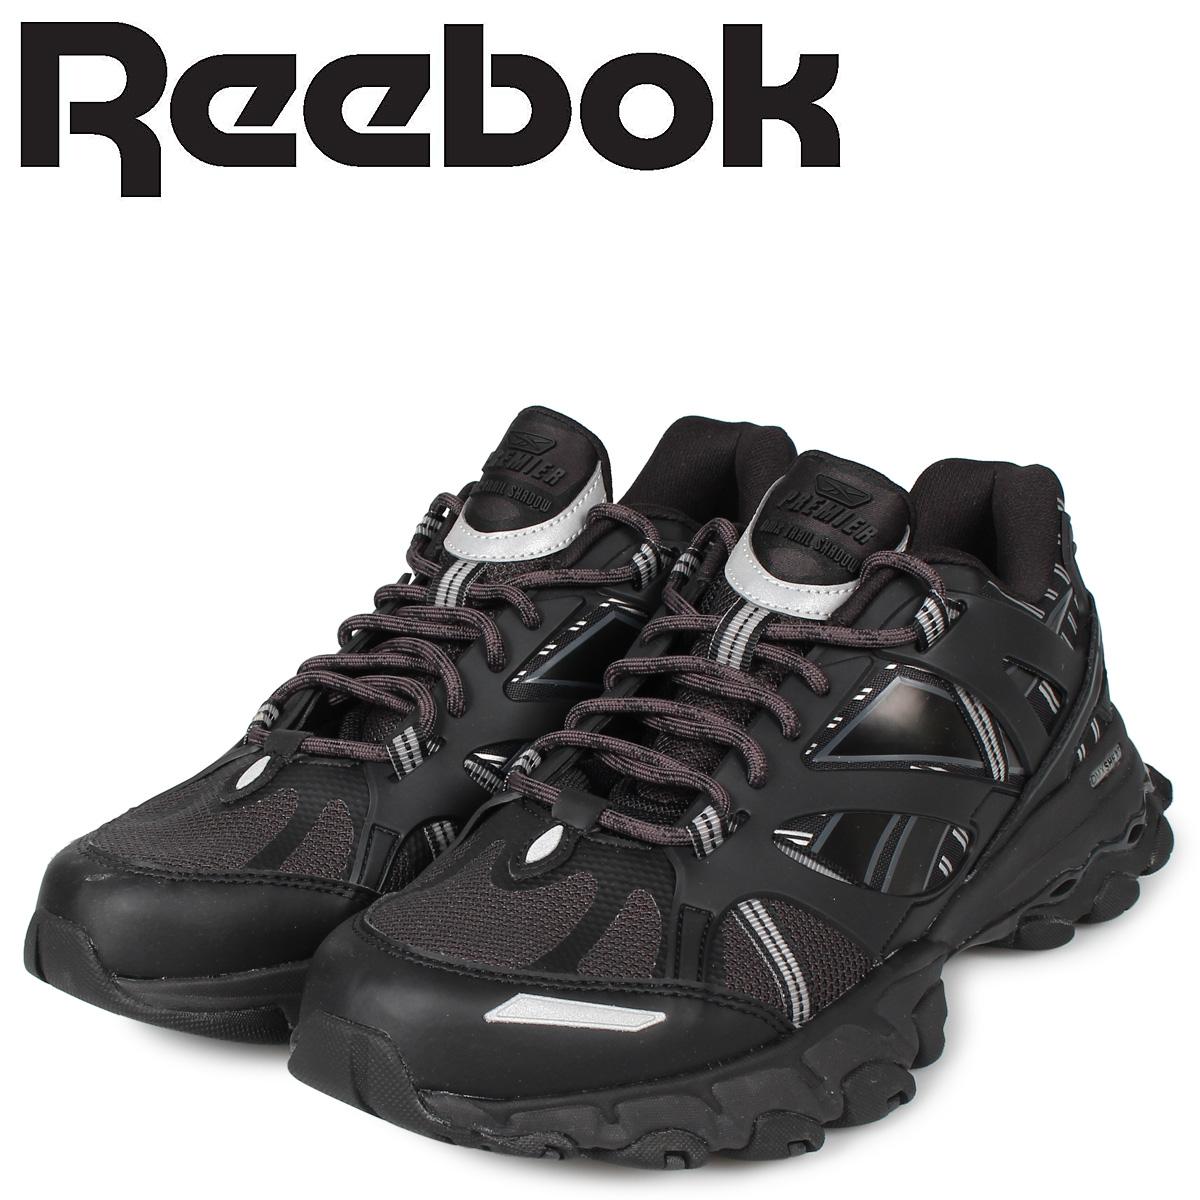 Reebok リーボック ディーエムエックス トレイル シャドウ スニーカー メンズ DMX TRAIL SHADOW ブラック 黒 EF8811